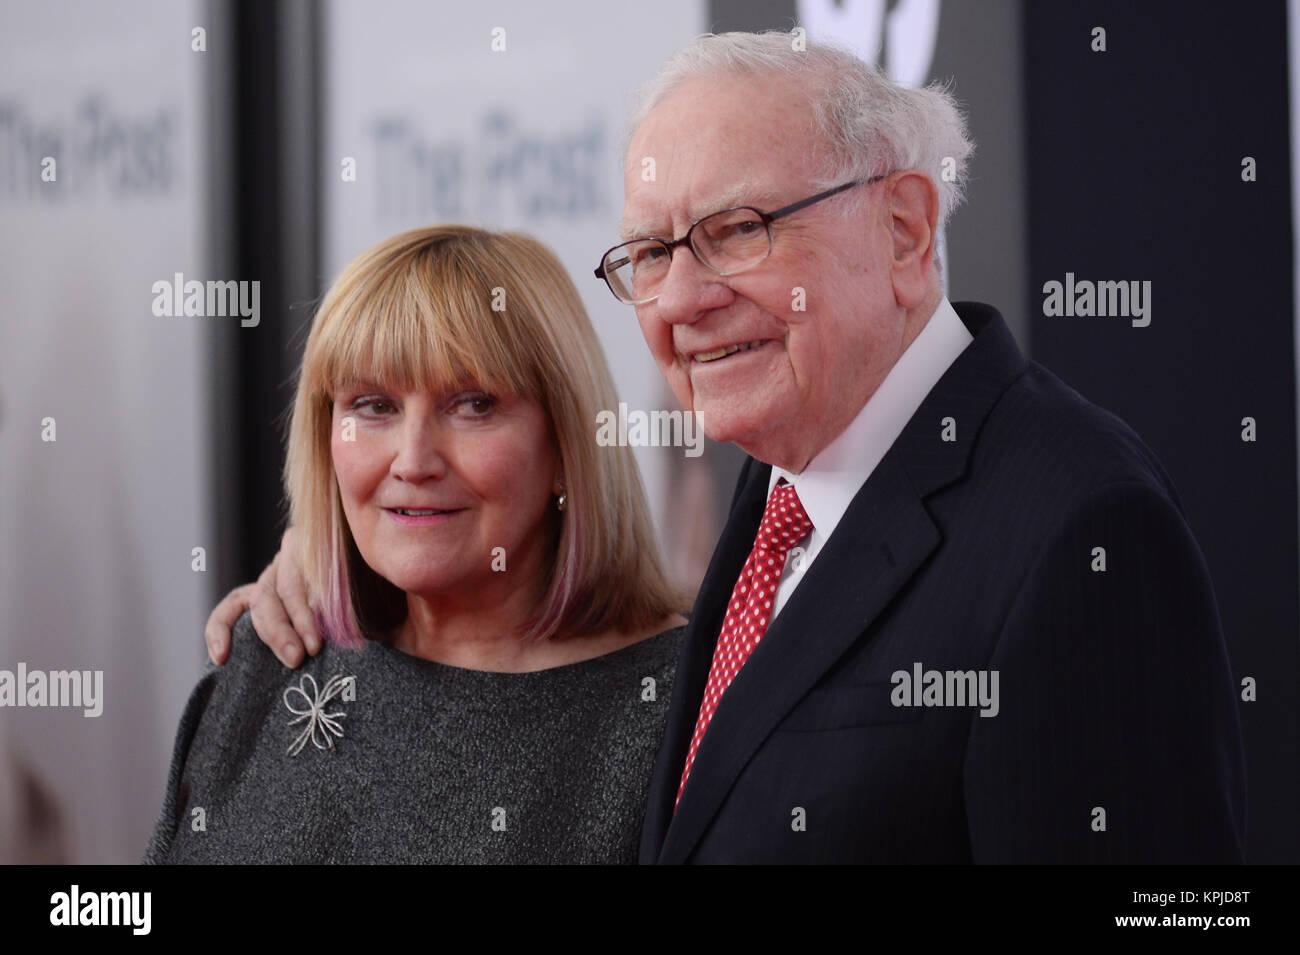 Susan Buffett and Warren Buffett arrives at 'The Post' Washington, DC Premiere at The Newseum on December - Stock Image